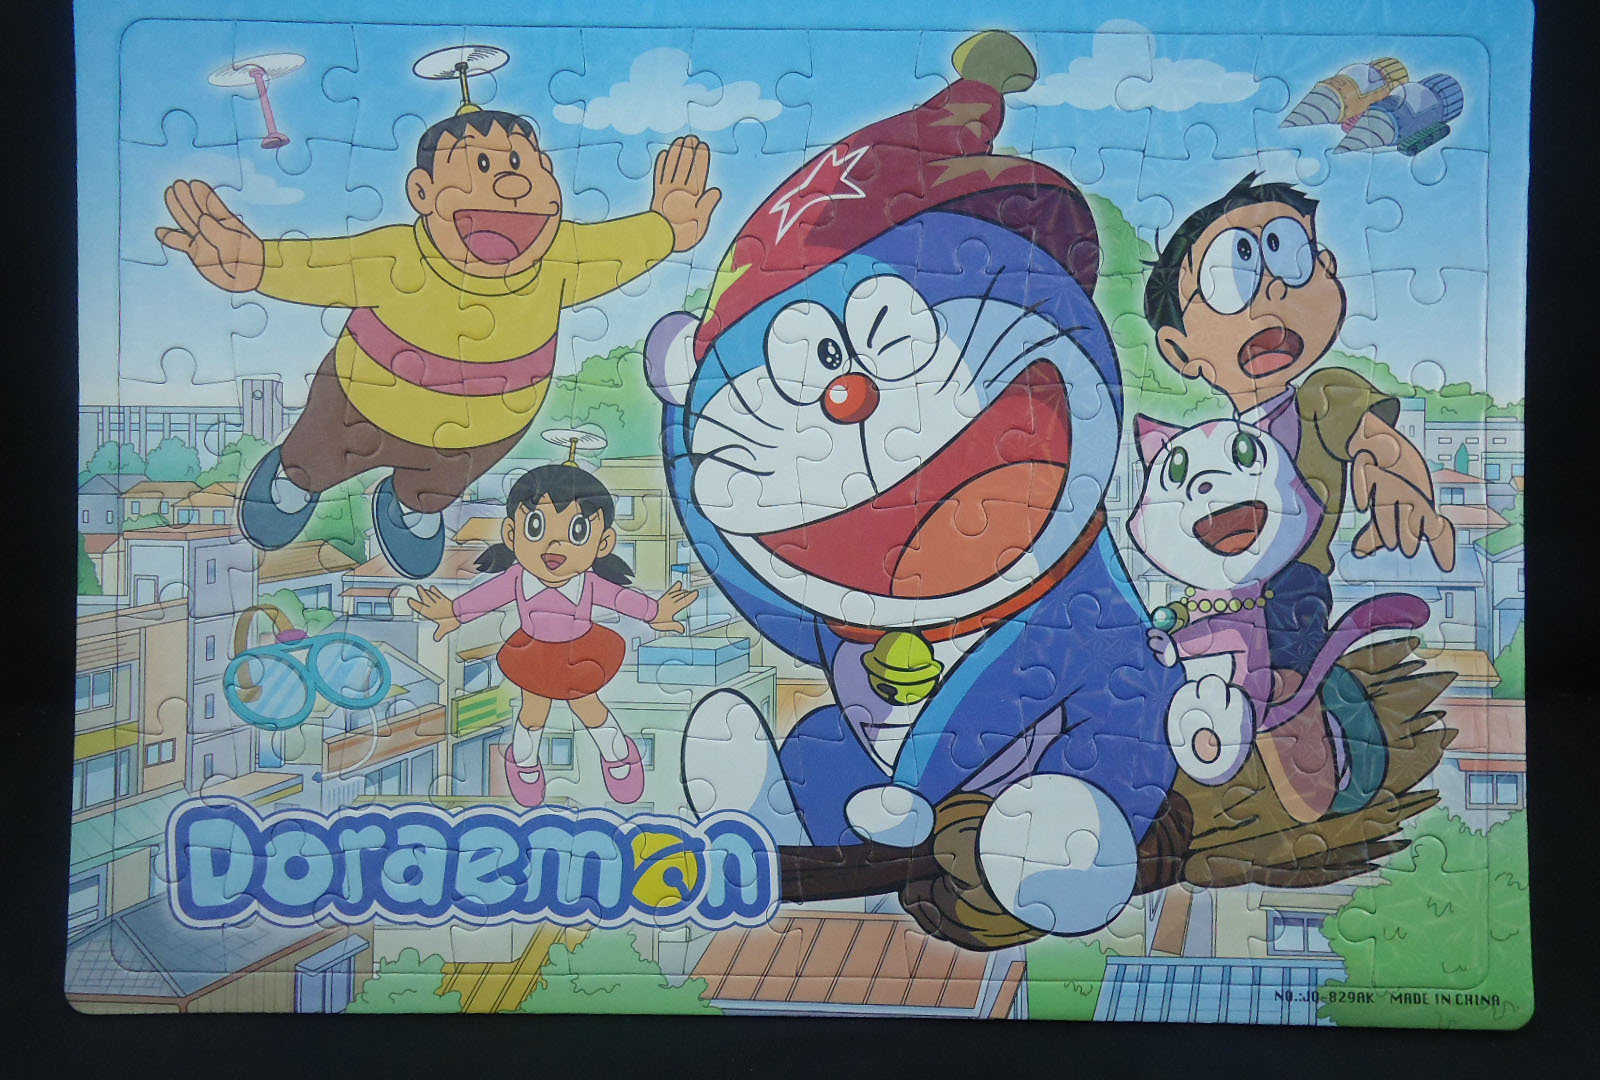 Jingle Cats Jigsaw Puzzle 96 Block Flat Jigsaw Puzzle Educational CHILDREN'S Toy Doraemon Large Jigsaw Puzzle Doraemon